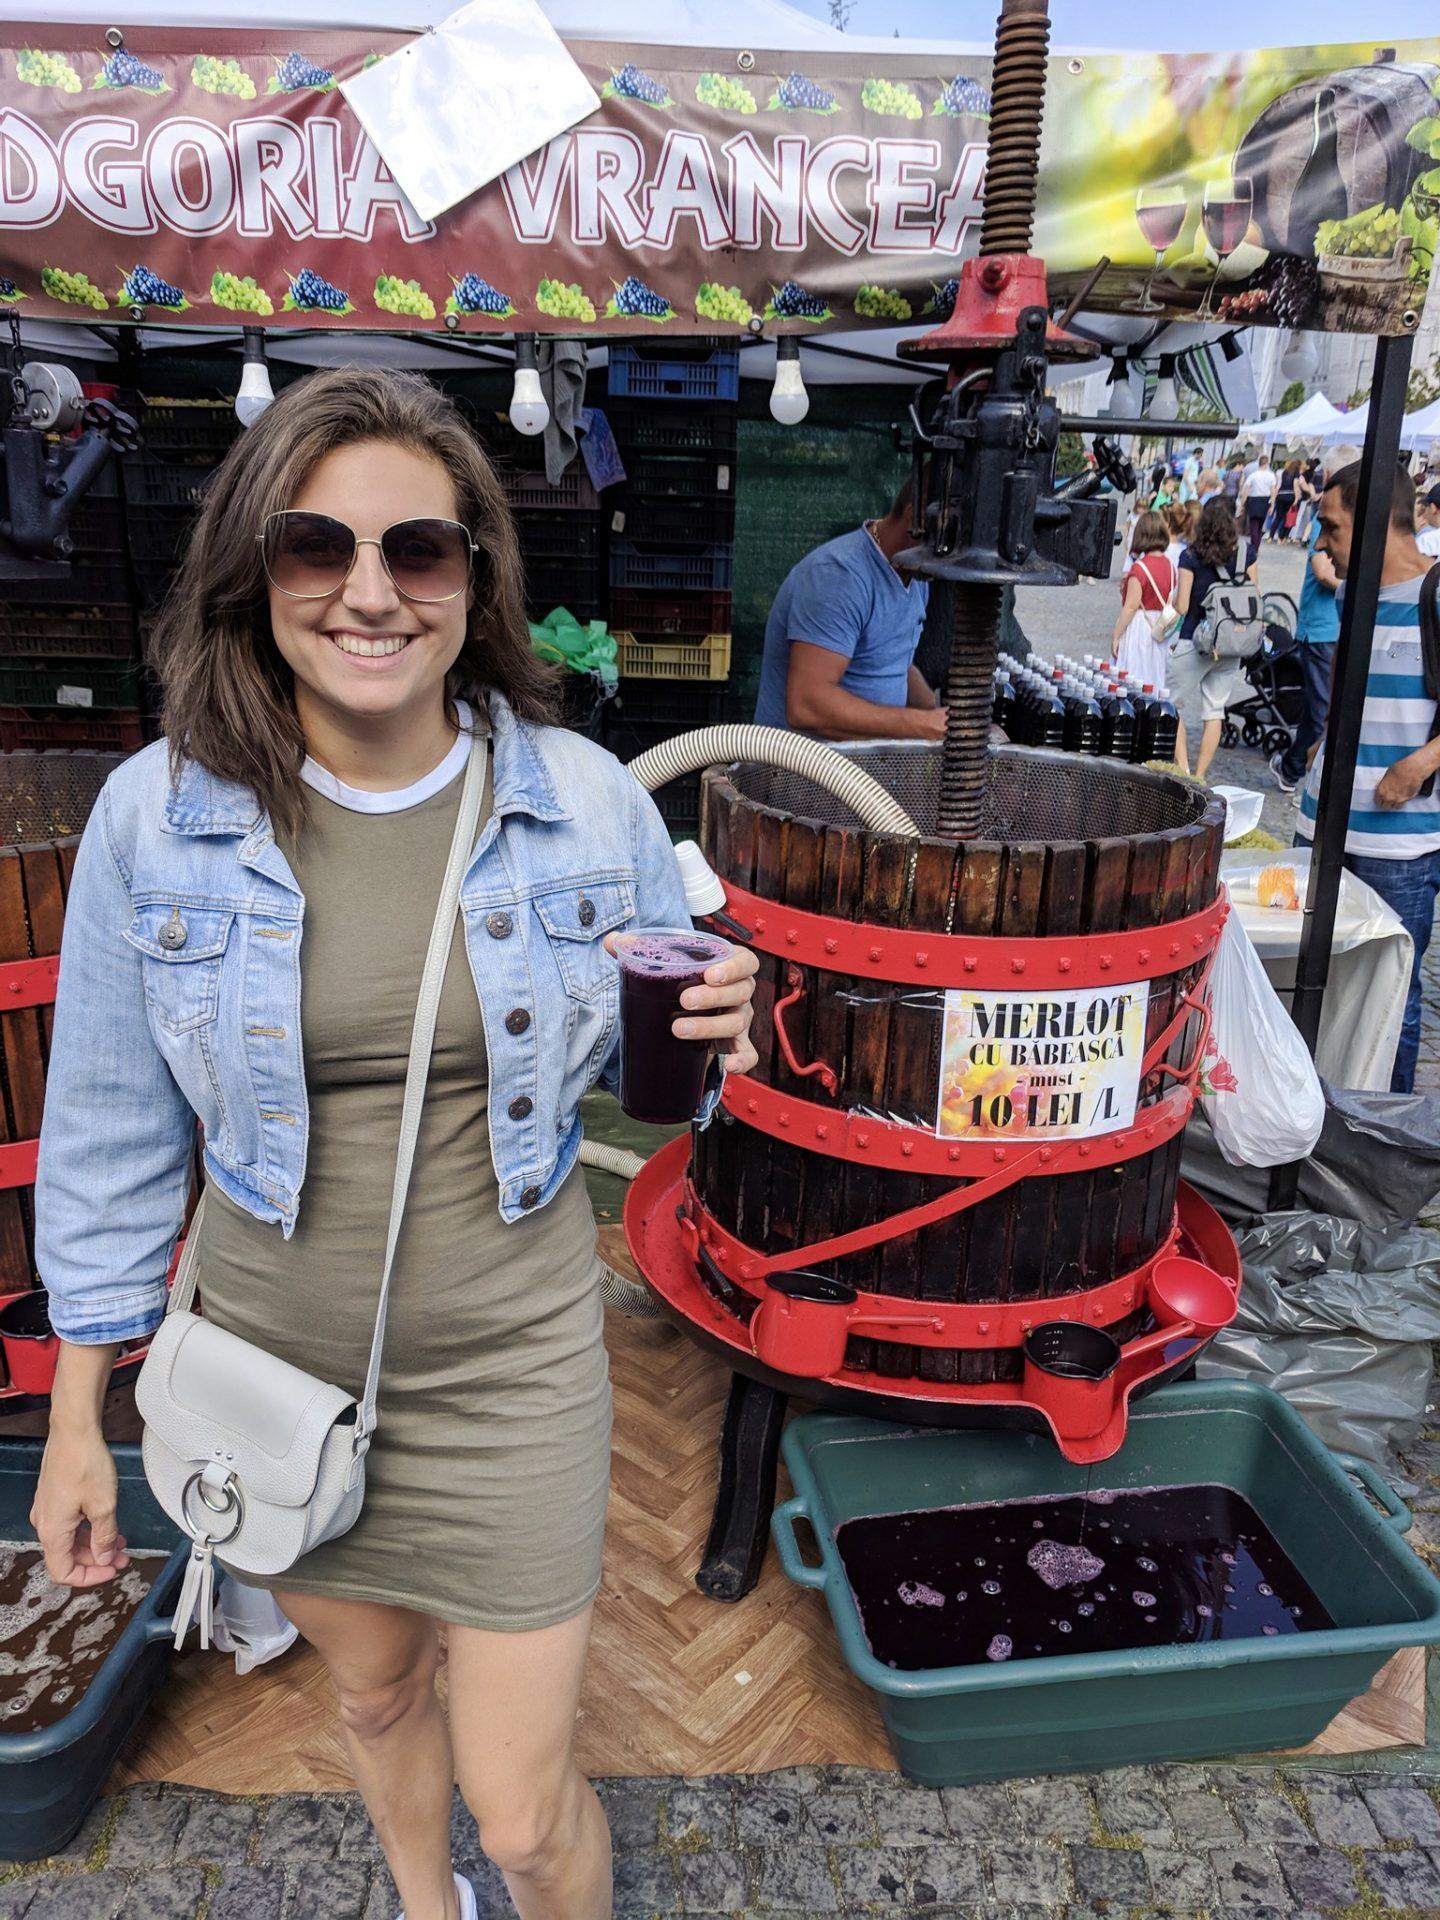 Girl in front of barrel of wine in Eastern Europe